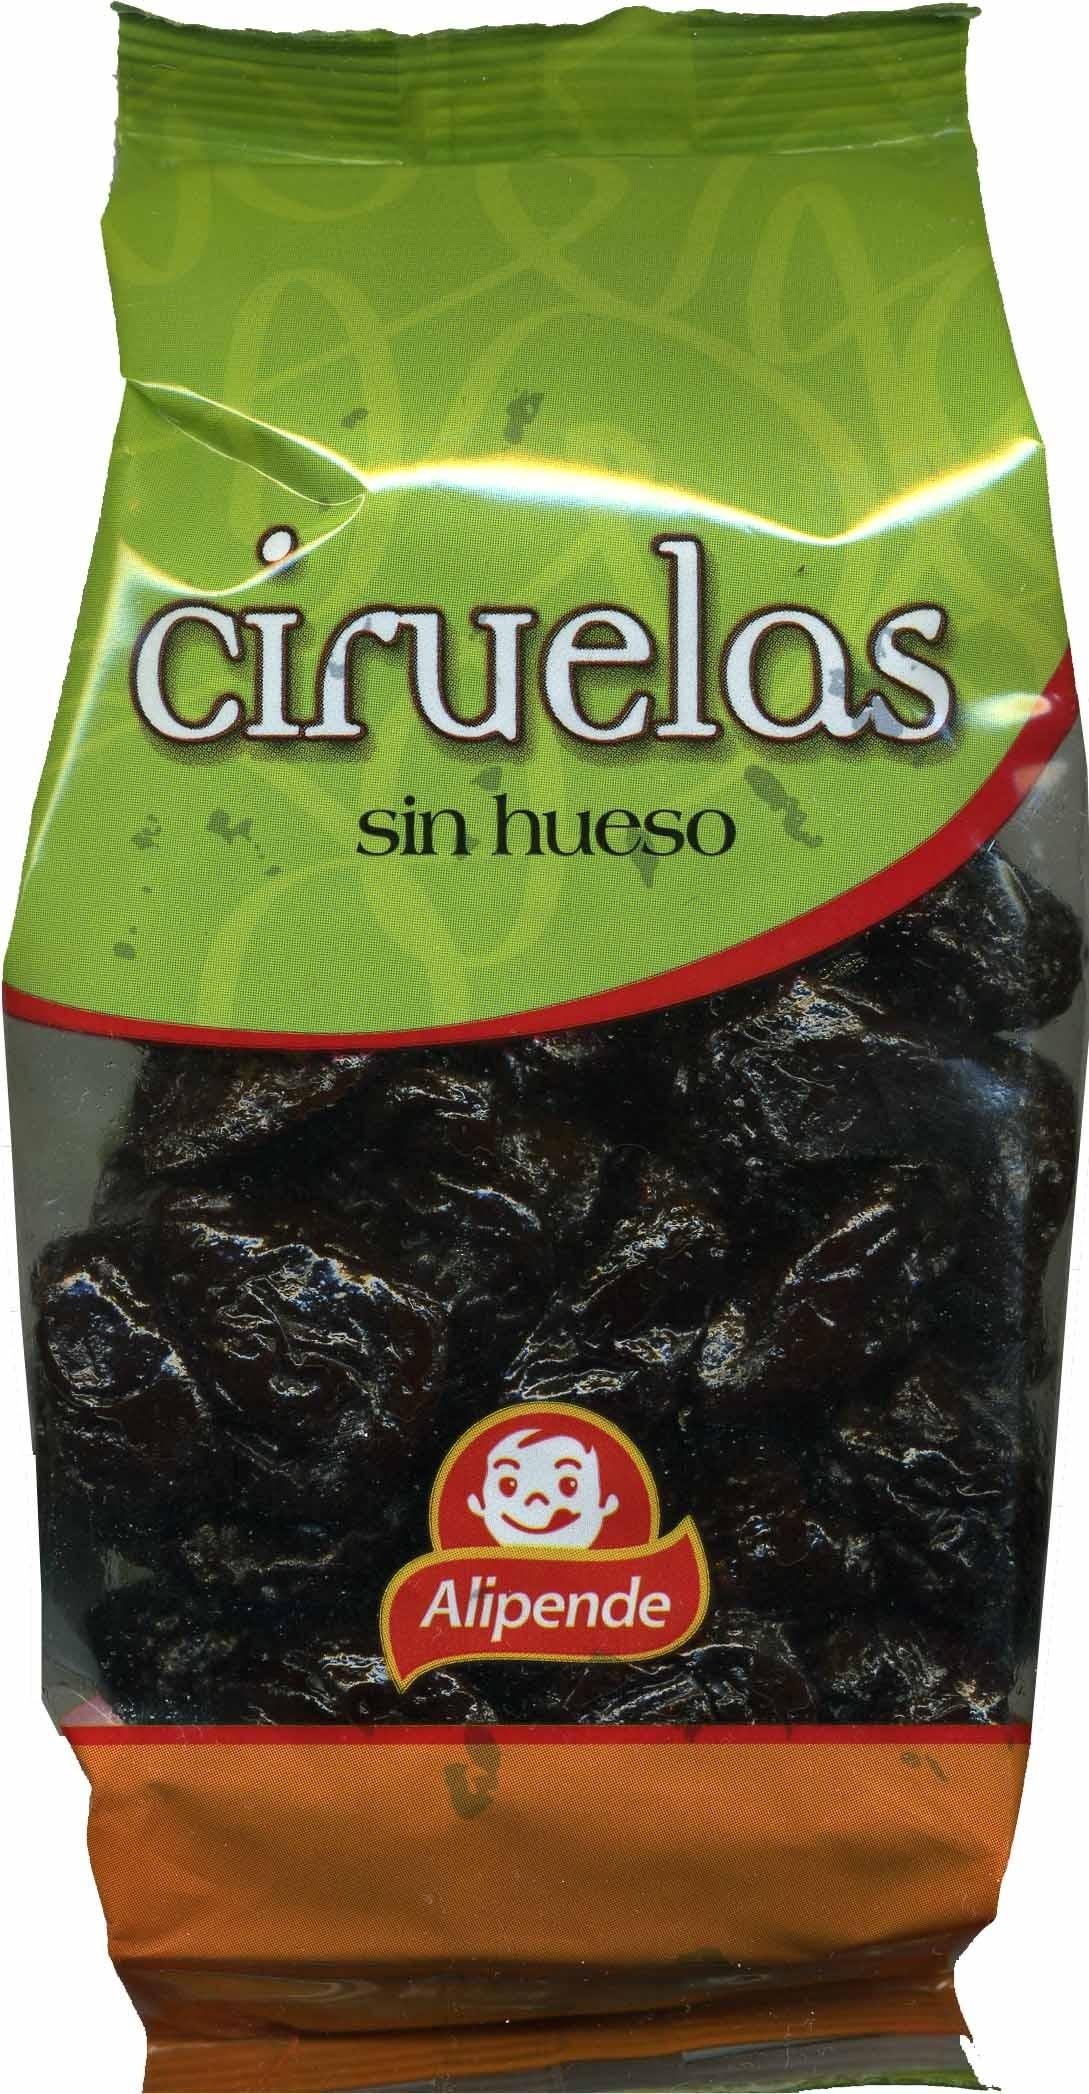 "Ciruelas pasas sin hueso ""Alipende"" - Product"